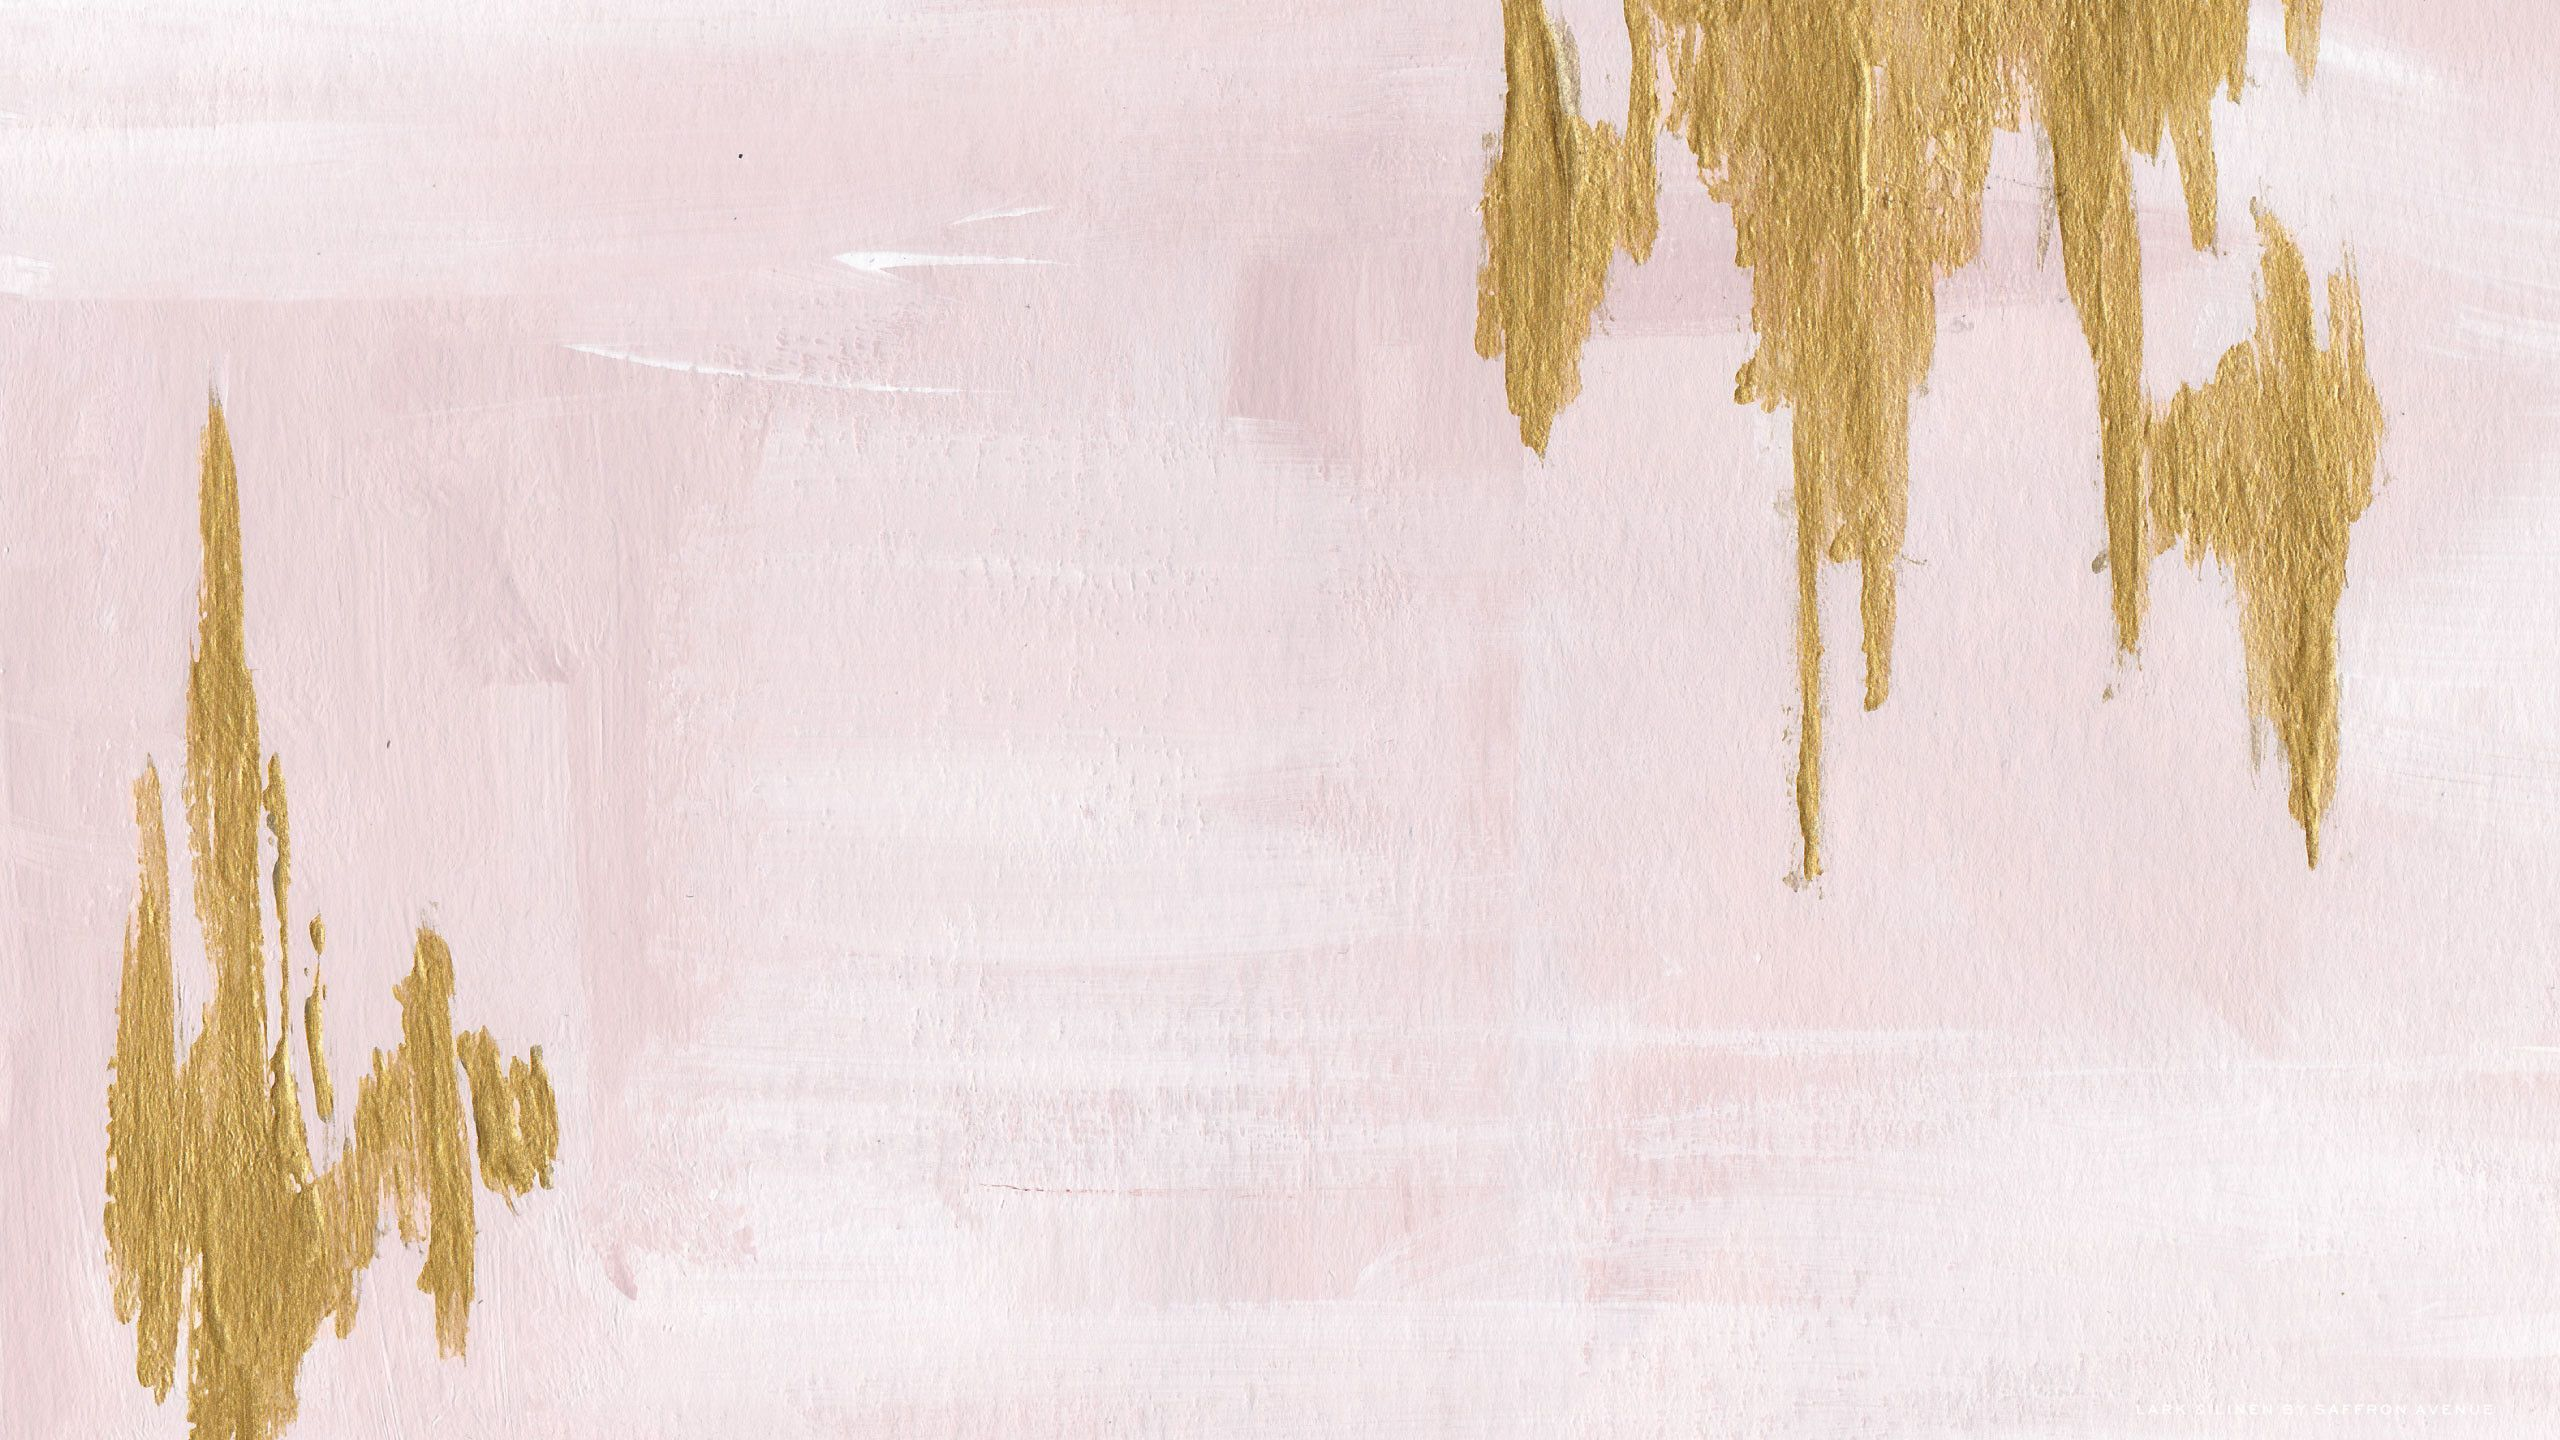 Pink Marble Desktop Wallpapers Top Free Pink Marble Desktop Backgrounds Wallpaperacce Rose Gold Wallpaper Floral Wallpaper Desktop Marble Desktop Wallpaper